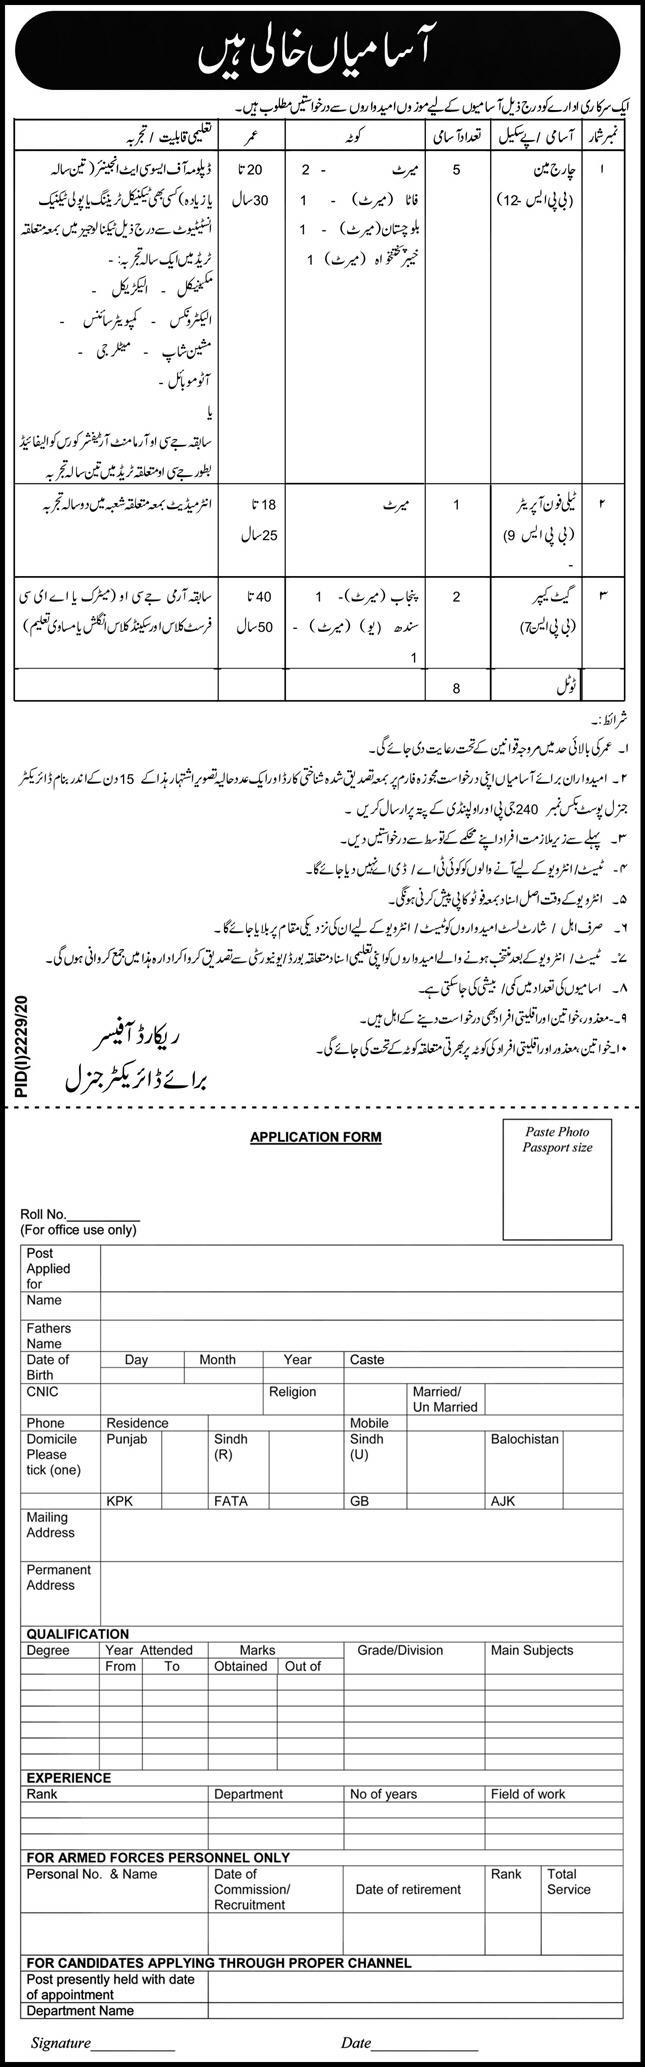 Public Sector Organization Latest November Jobs in Pakistan Jobs 2021-2022